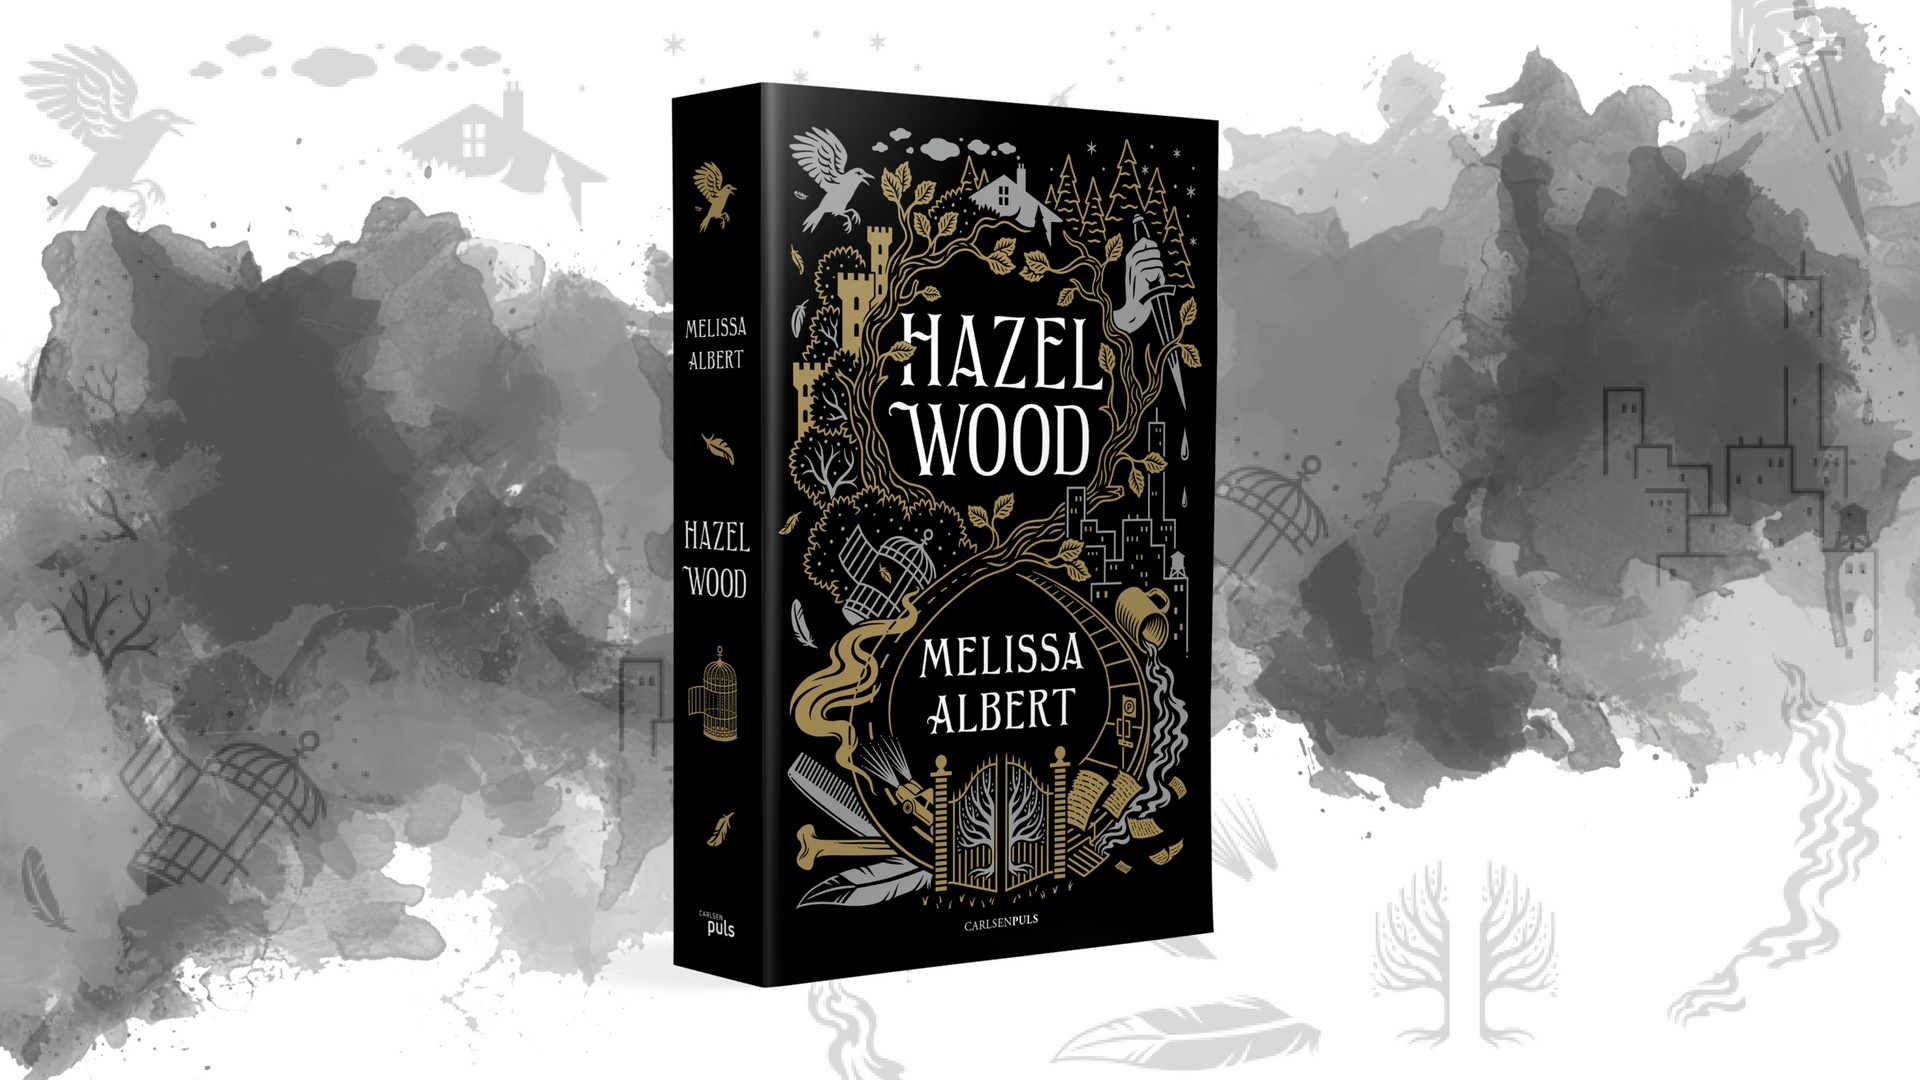 Hazel wood, hazelwood, melissa albert, young adult, fantasy, fantasyromaner